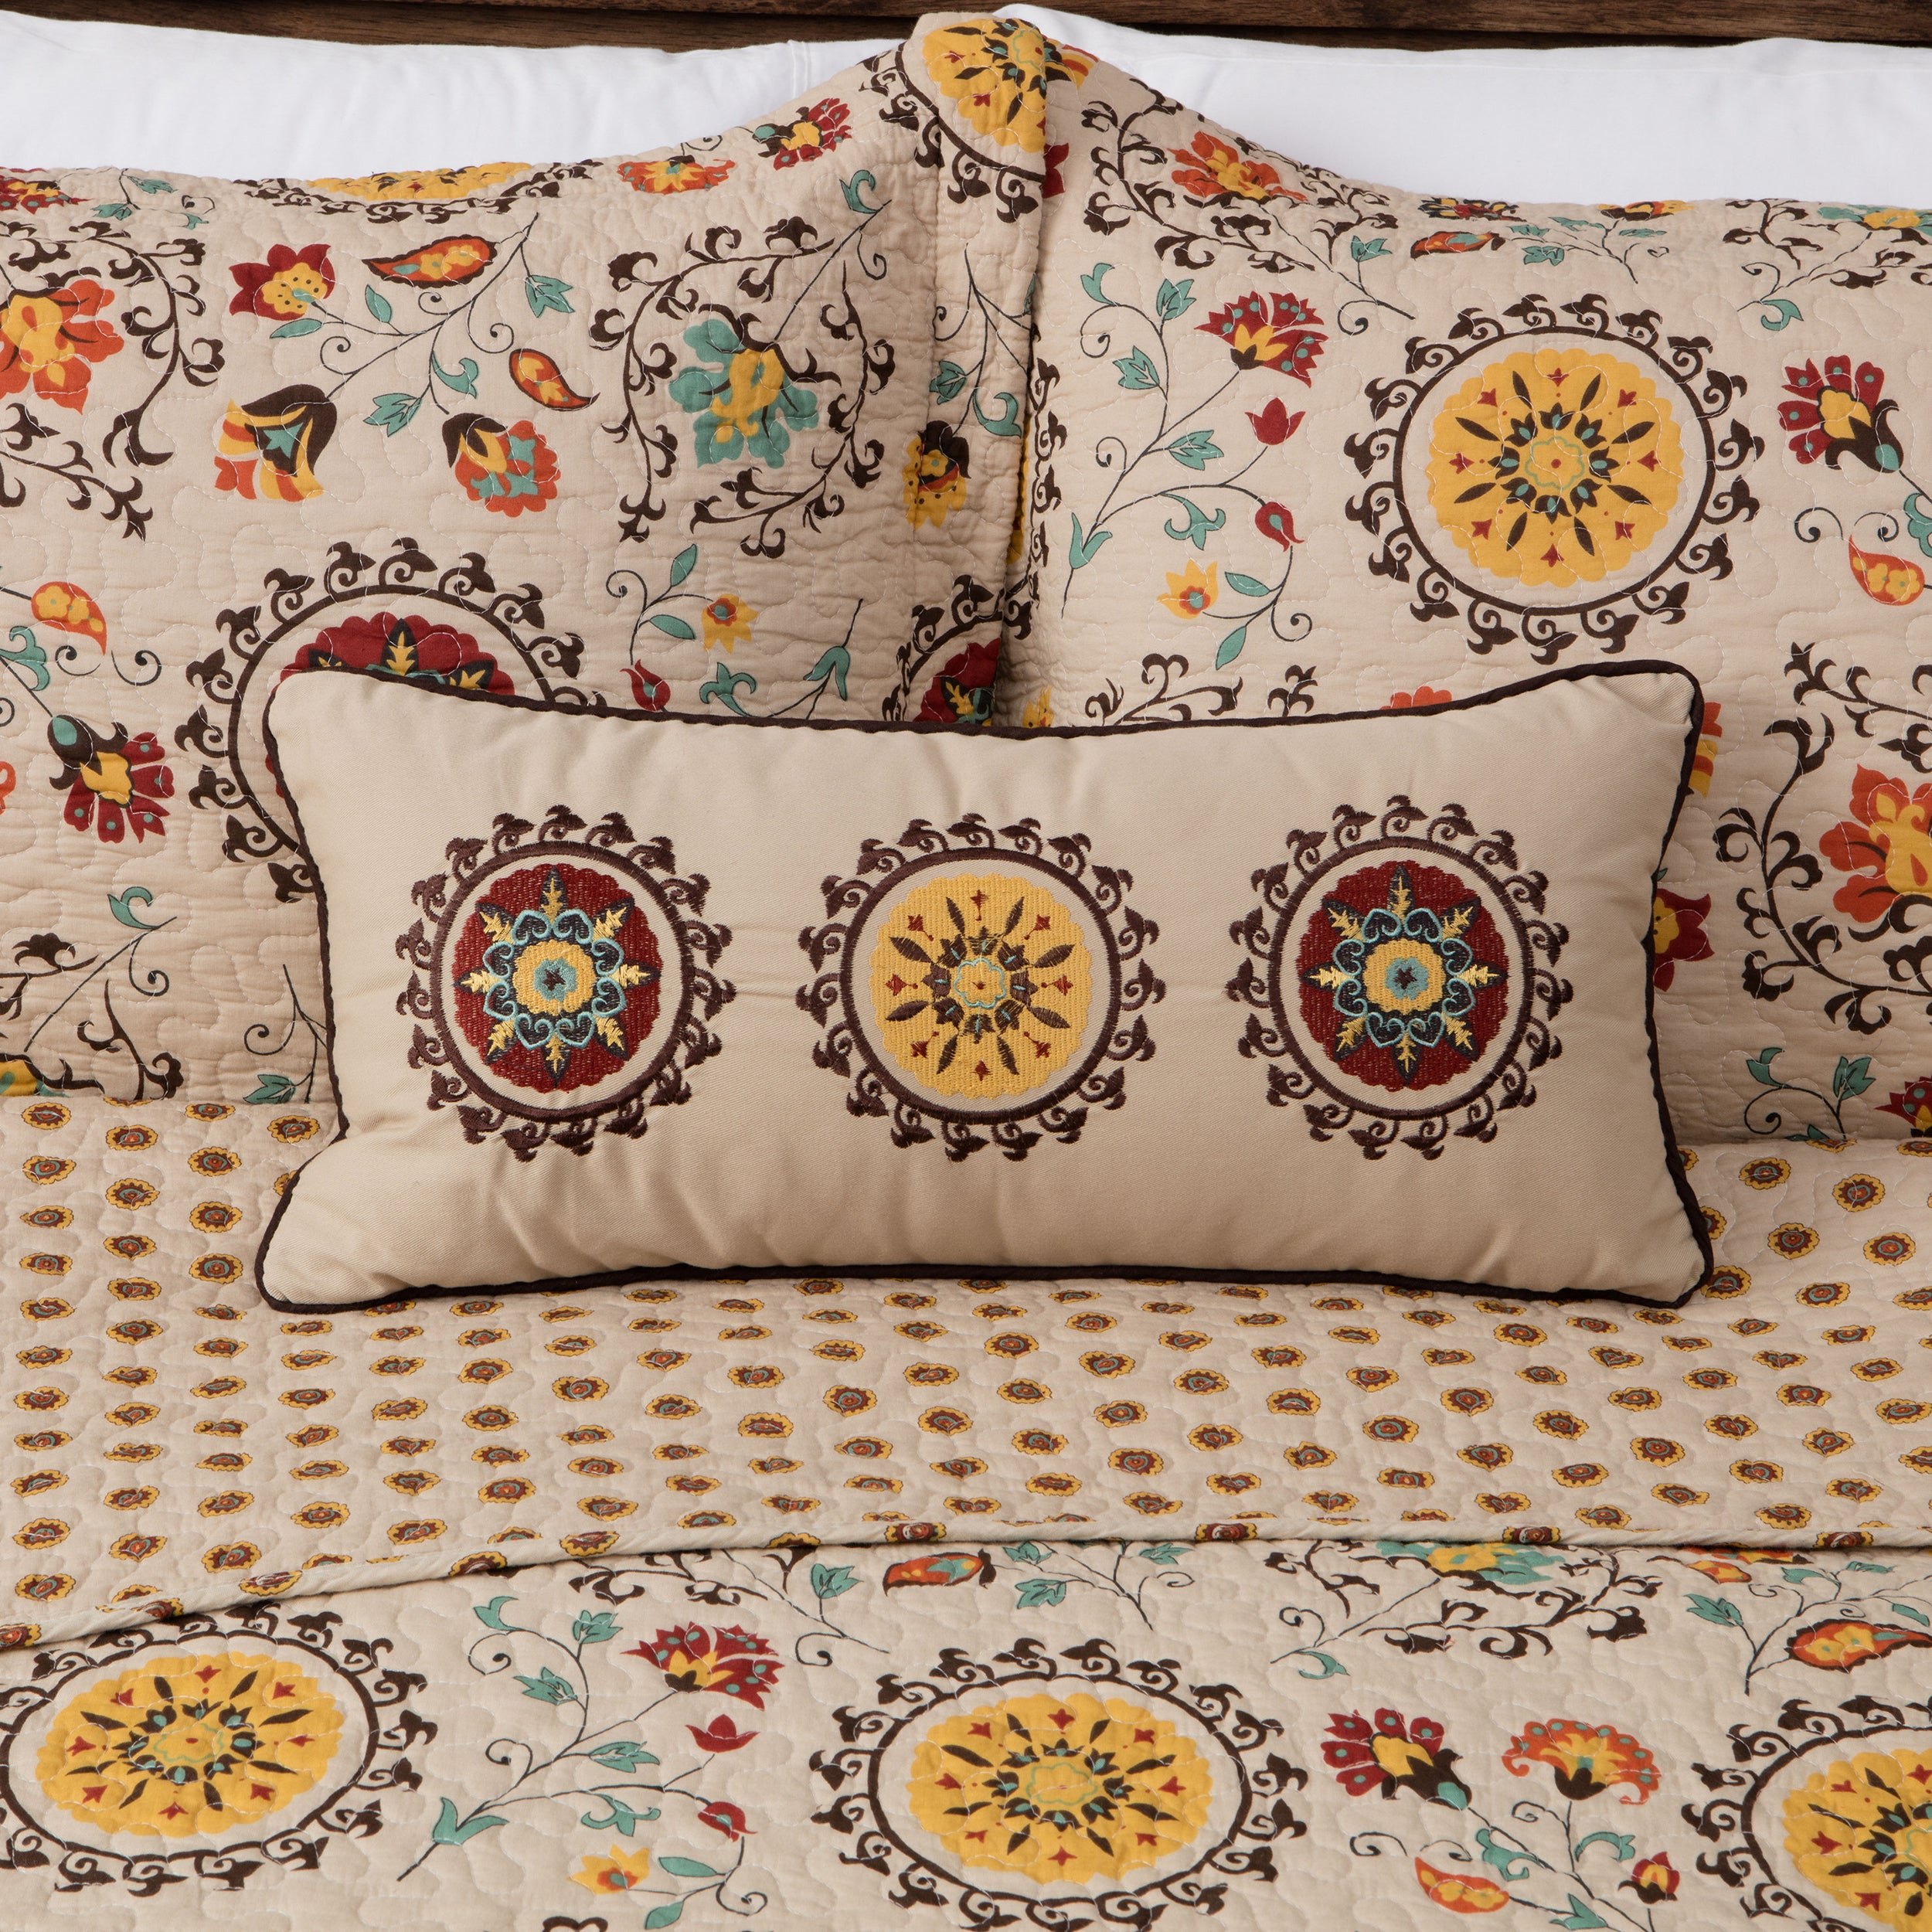 Overstock.com Andorra Neck Roll Decorative Pillow at Sears.com